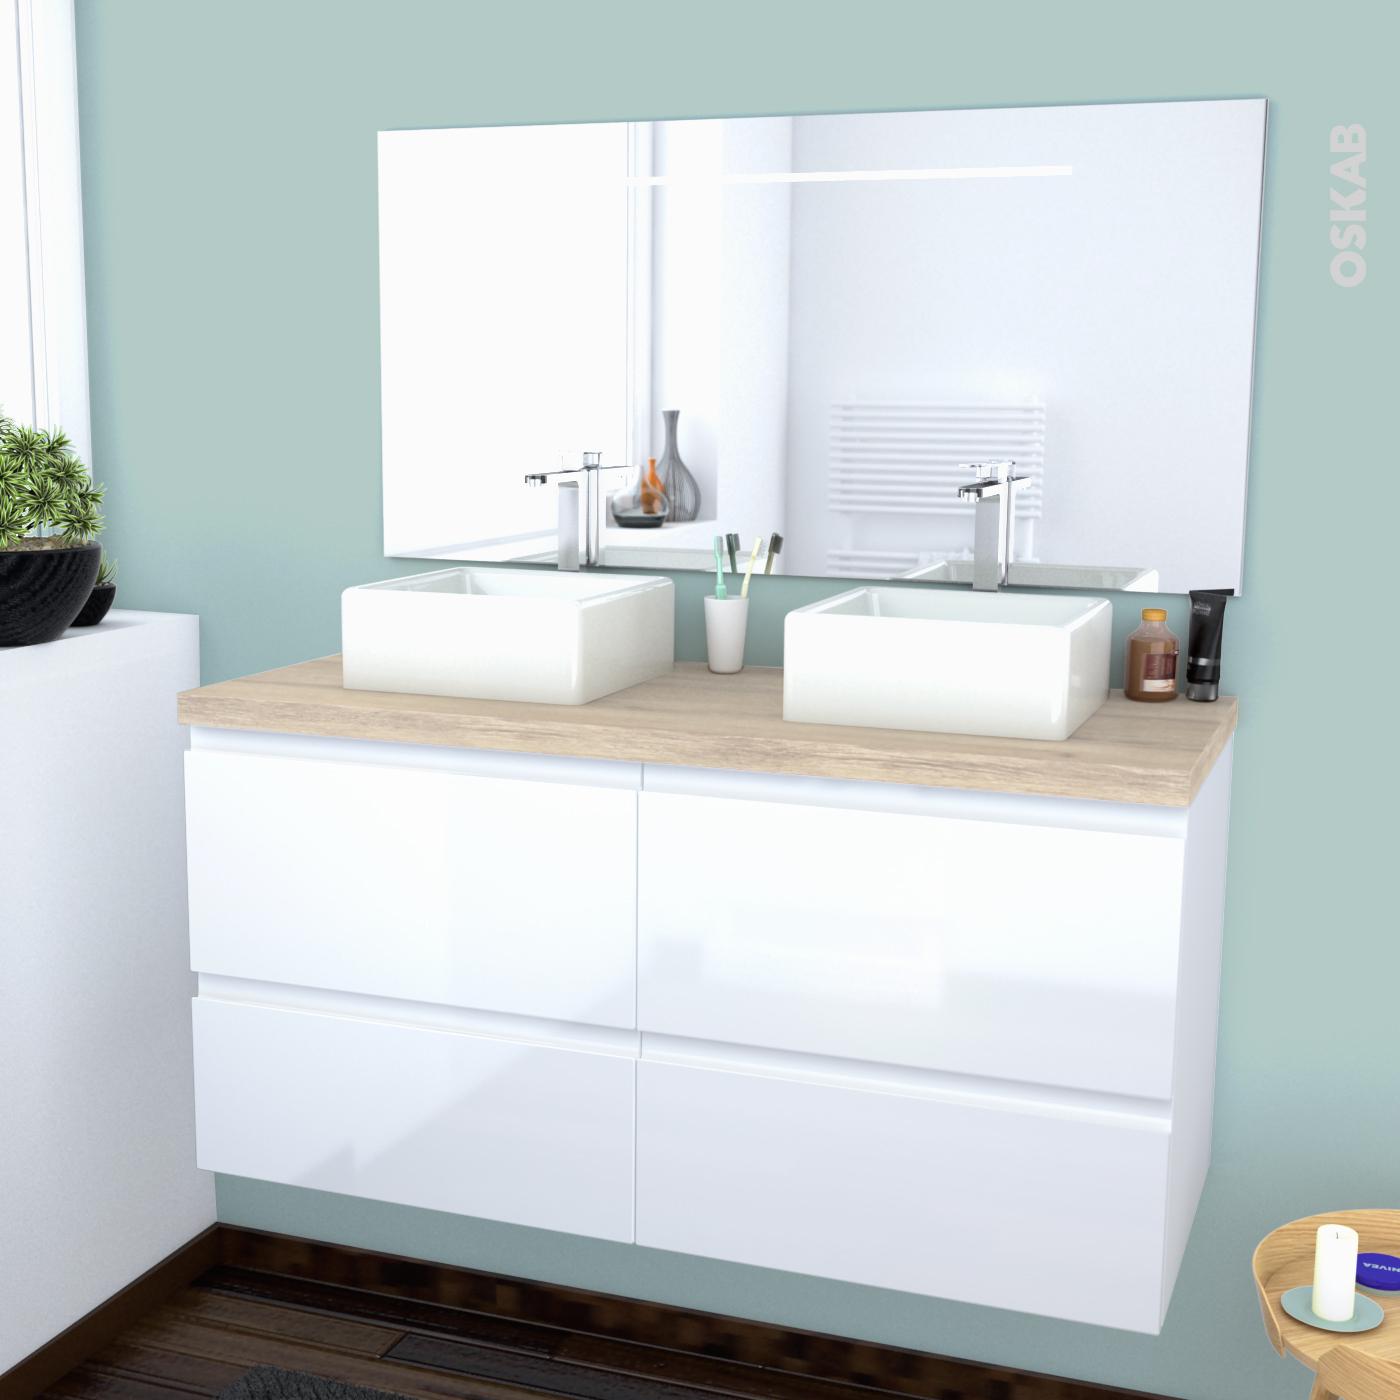 Ensemble salle de bains Meuble IPOMA Blanc brillant Plan de toilette Chêne  clair Ikoro, Double vasque, Miroir lumineux, L120 x H57 x P50 cm